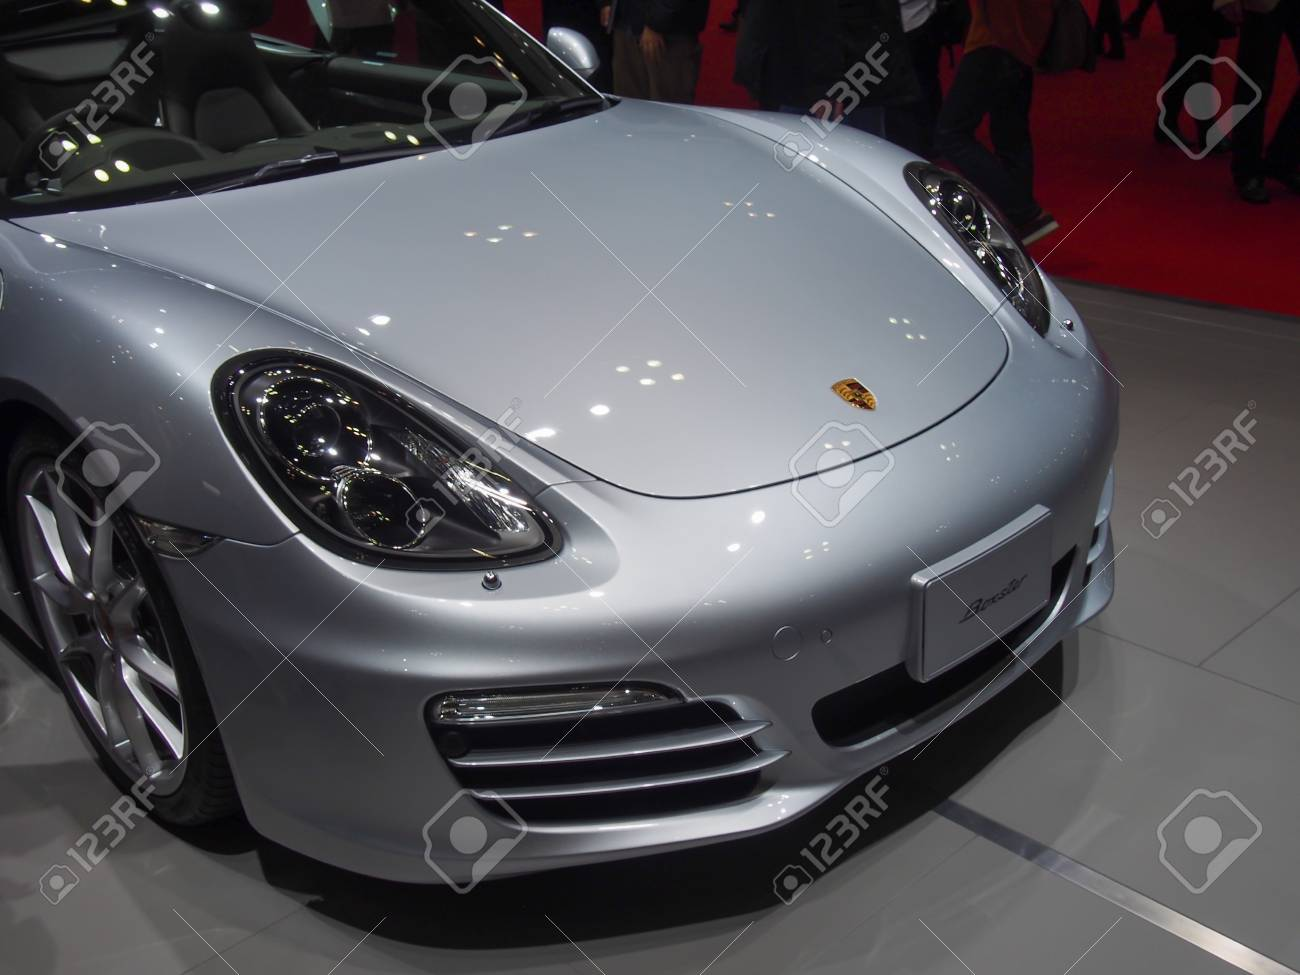 Tokyo Japan November 23 2013 Porsche 911 At The Booth Of Stock